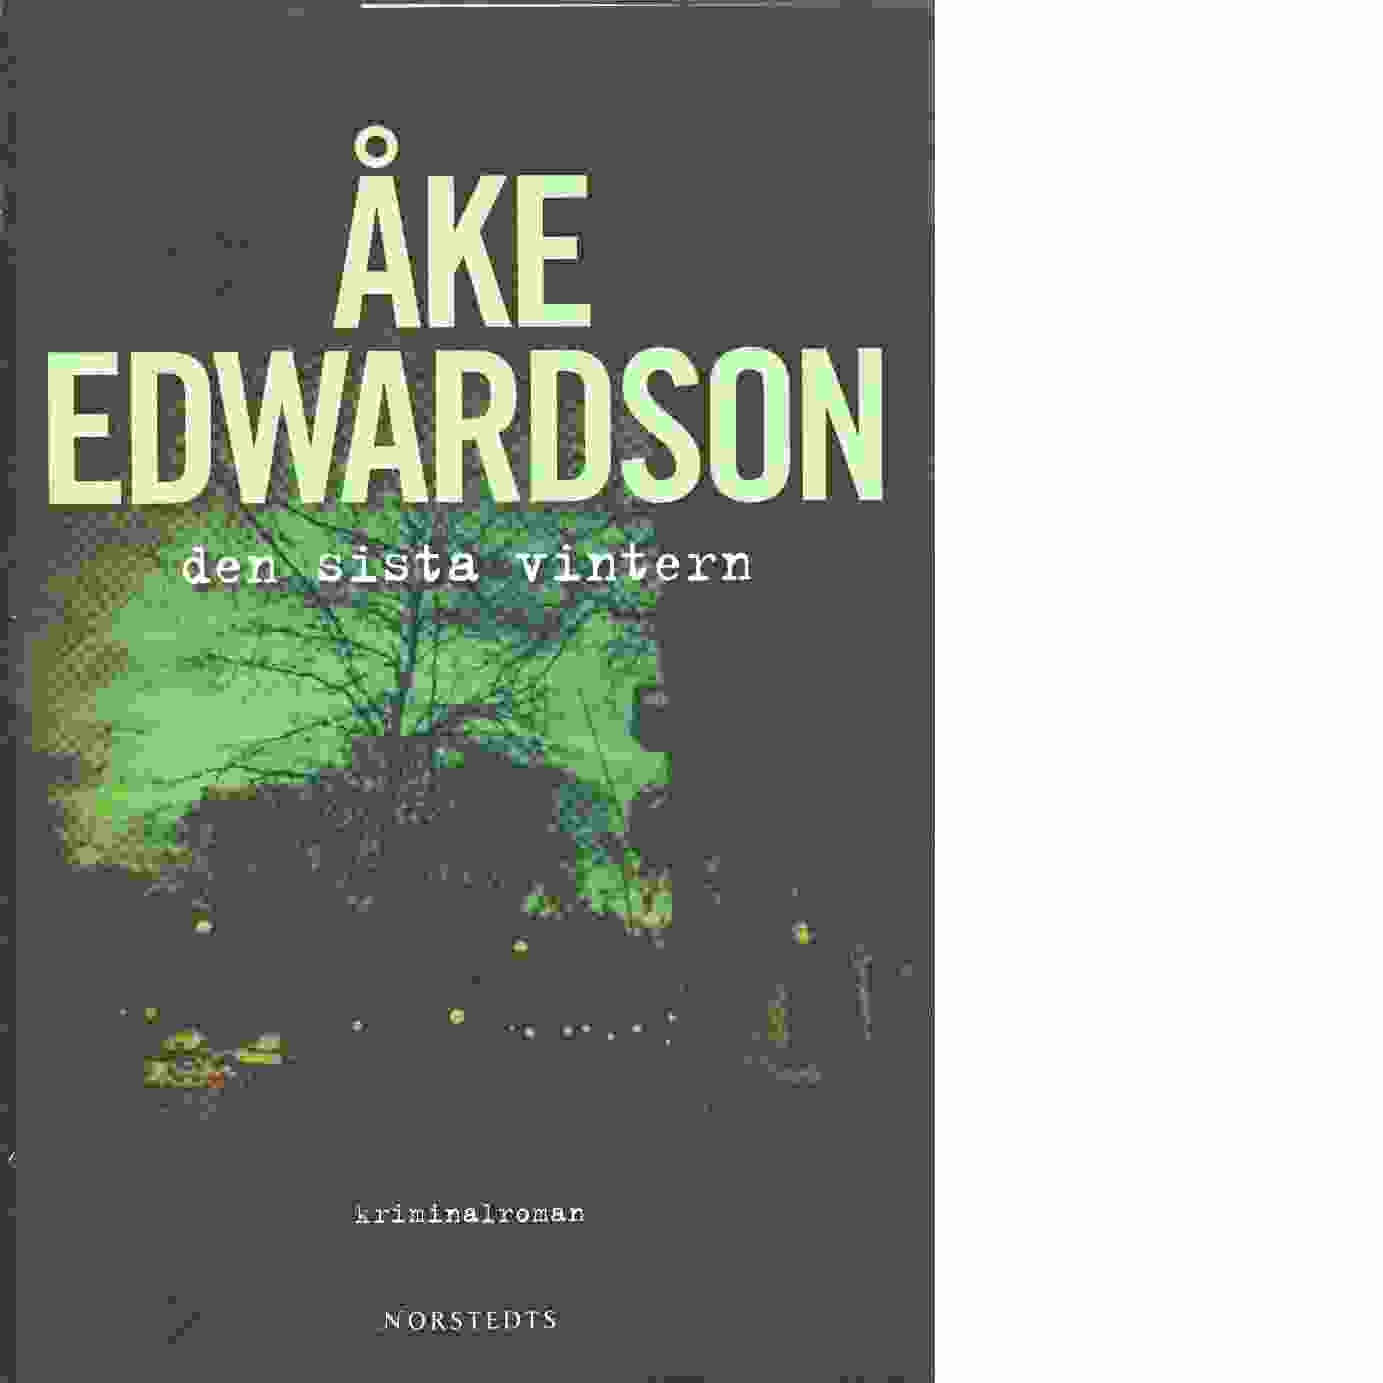 Den sista vintern - Edwardson, Åke